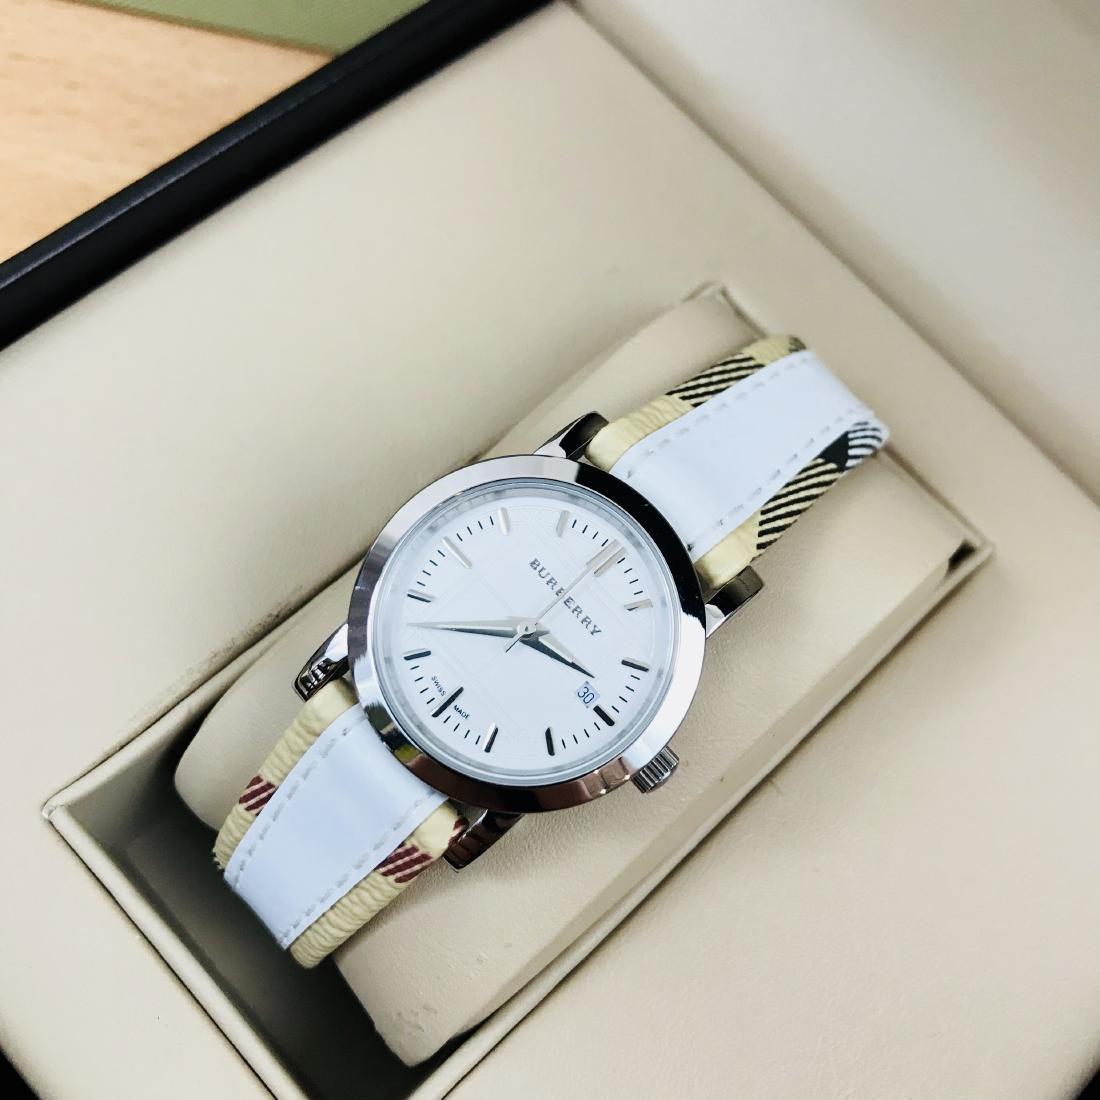 Burberry Swiss Made Classic Ladies Watch - 2